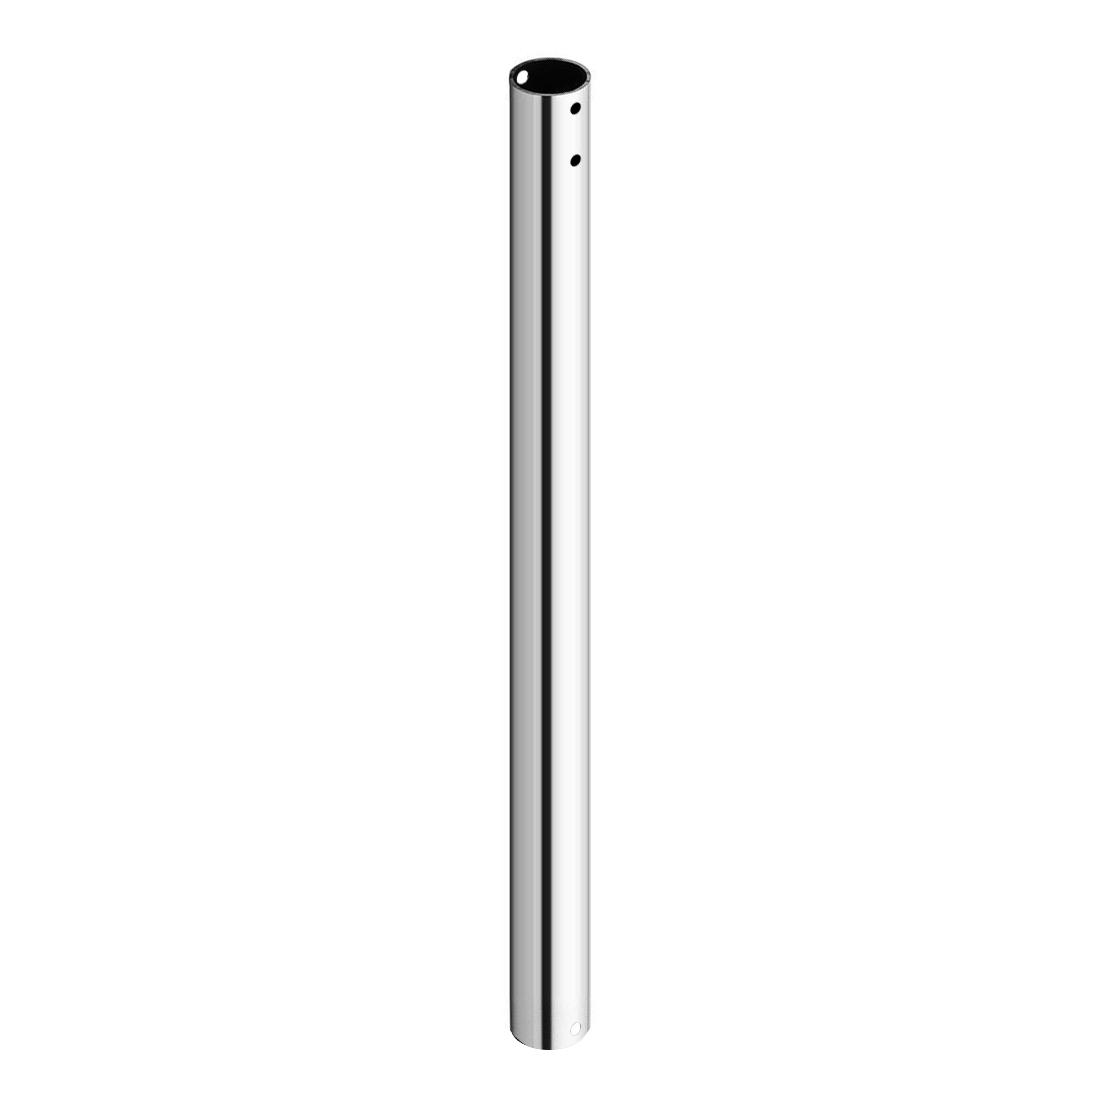 Peerless-AV MOD-P100 - Штанга диаметром 50,8 мм, длина 1000 мм